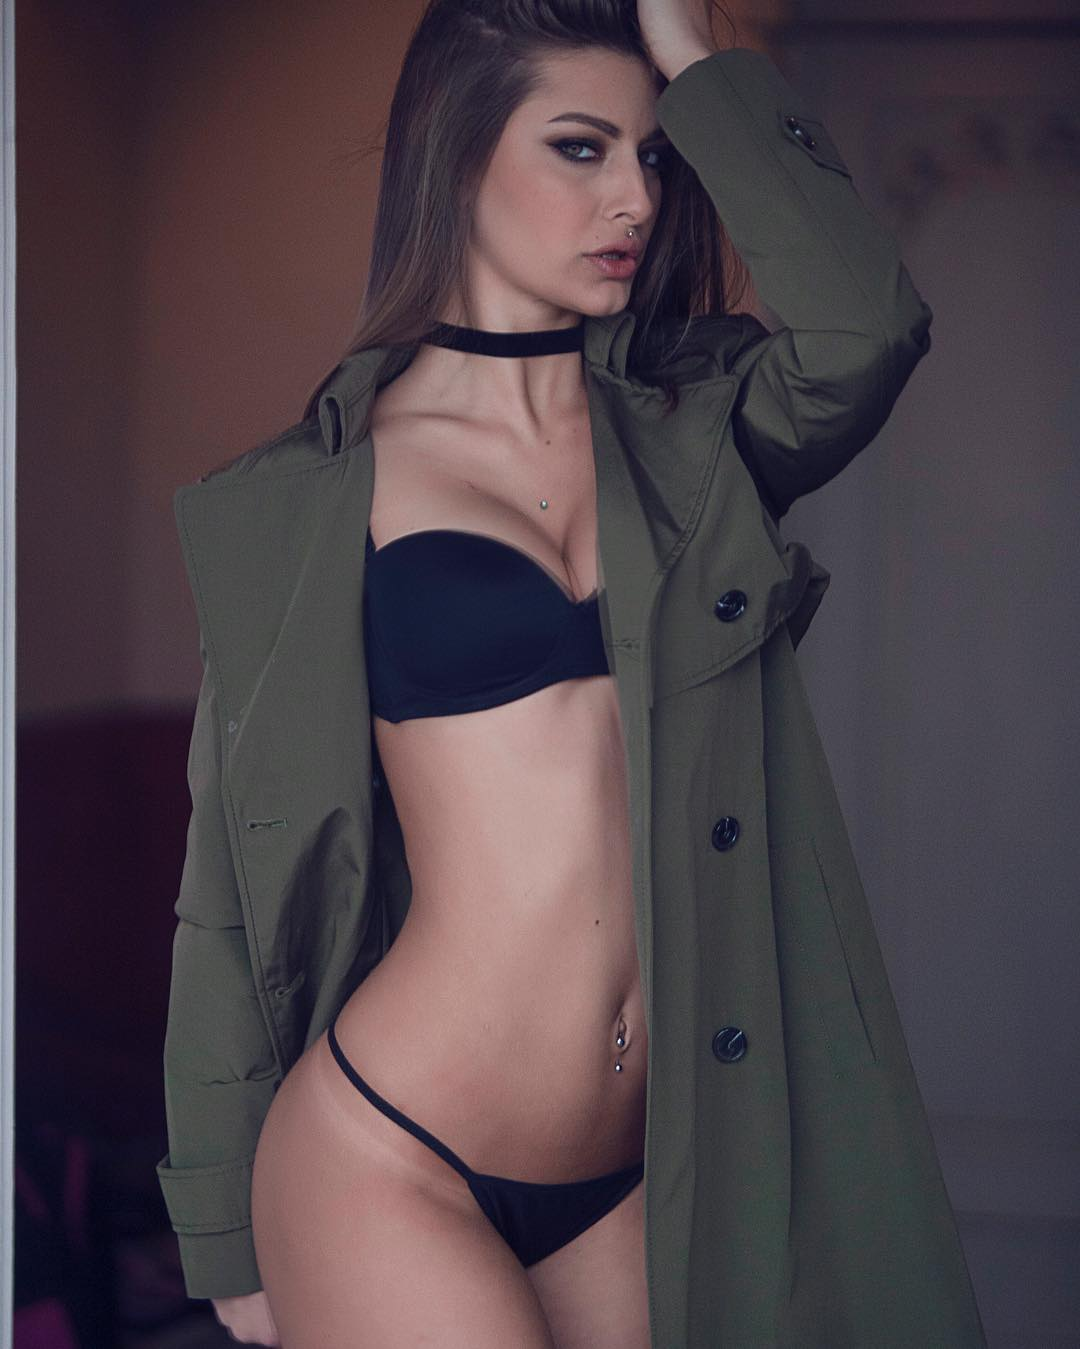 Fitness model Roberta Carluccio - Insta Fitness Models